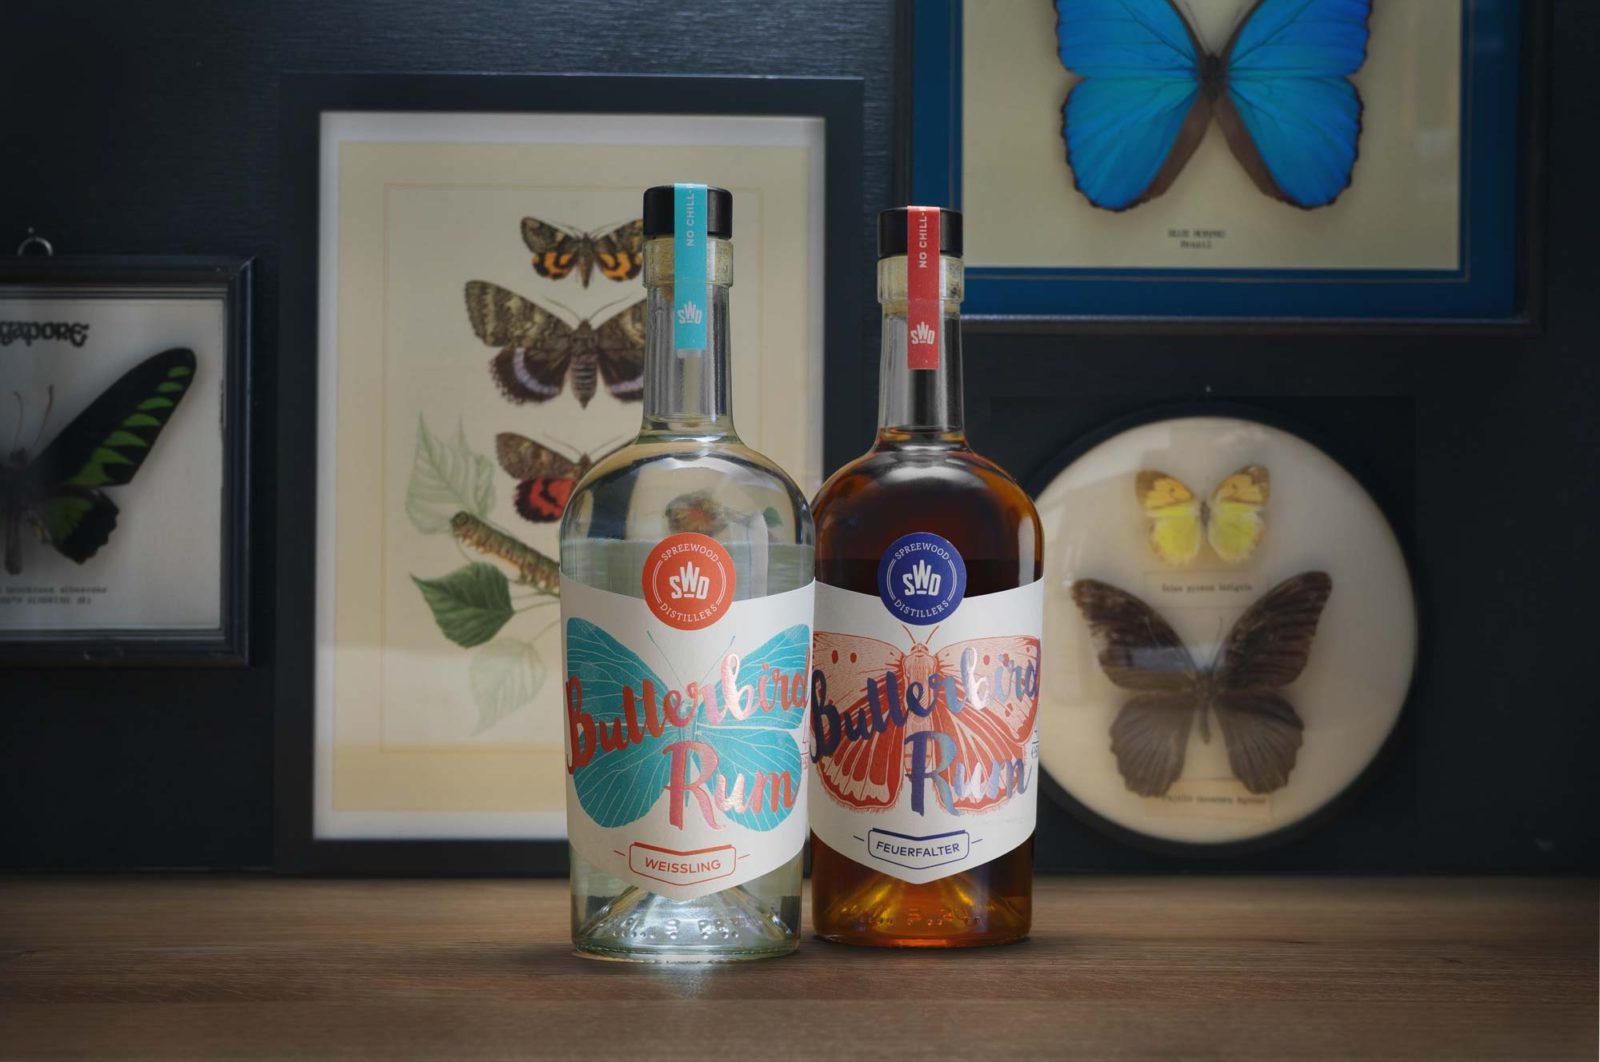 Editienne Kommunikationsdesign- Packaging Design goes Rum- Butterbird Rum 3